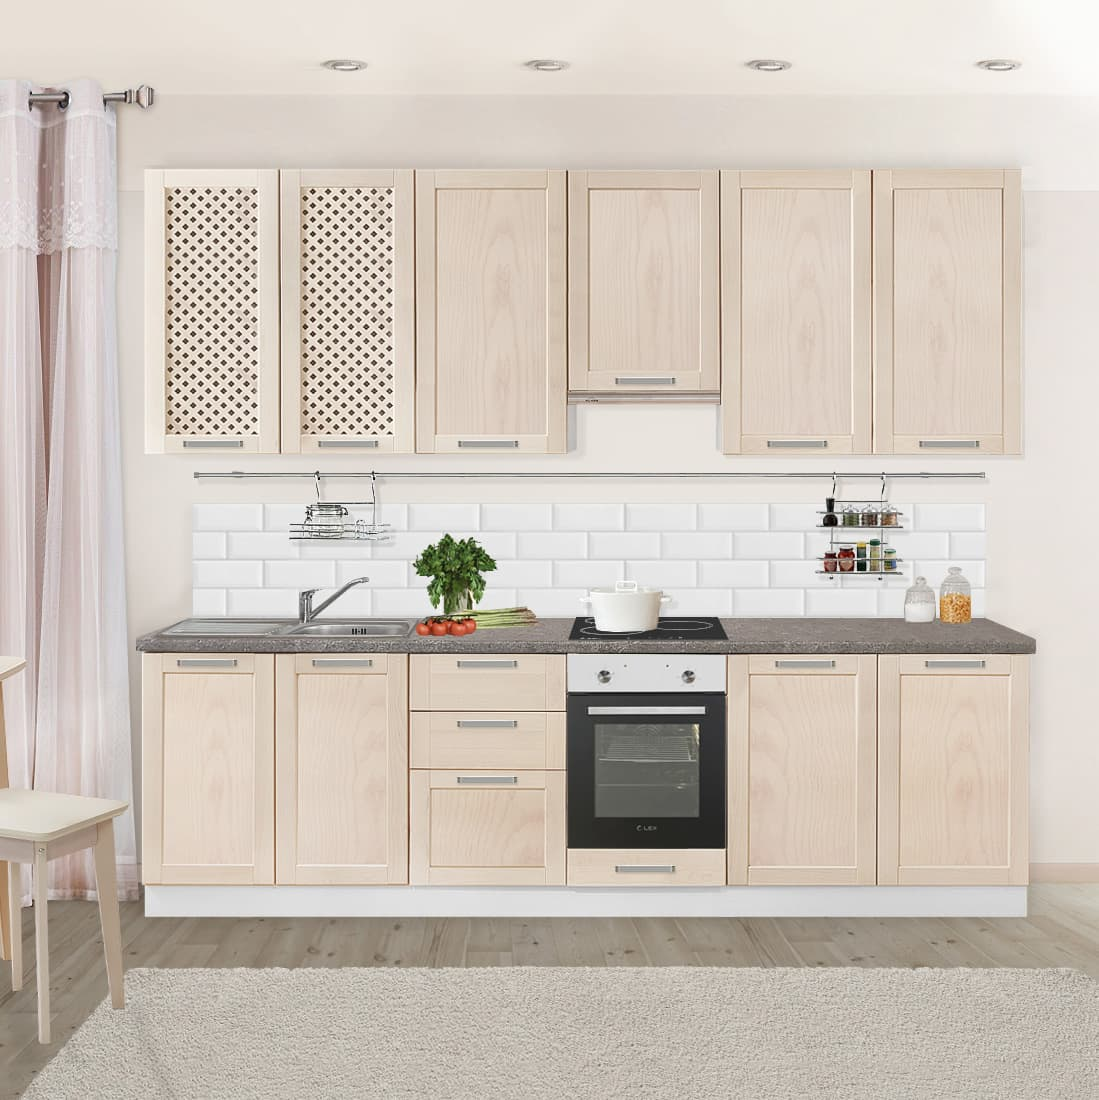 Кухня модульная #КБ_3025. Фасады массив березы. Цвет Выбеленная береза